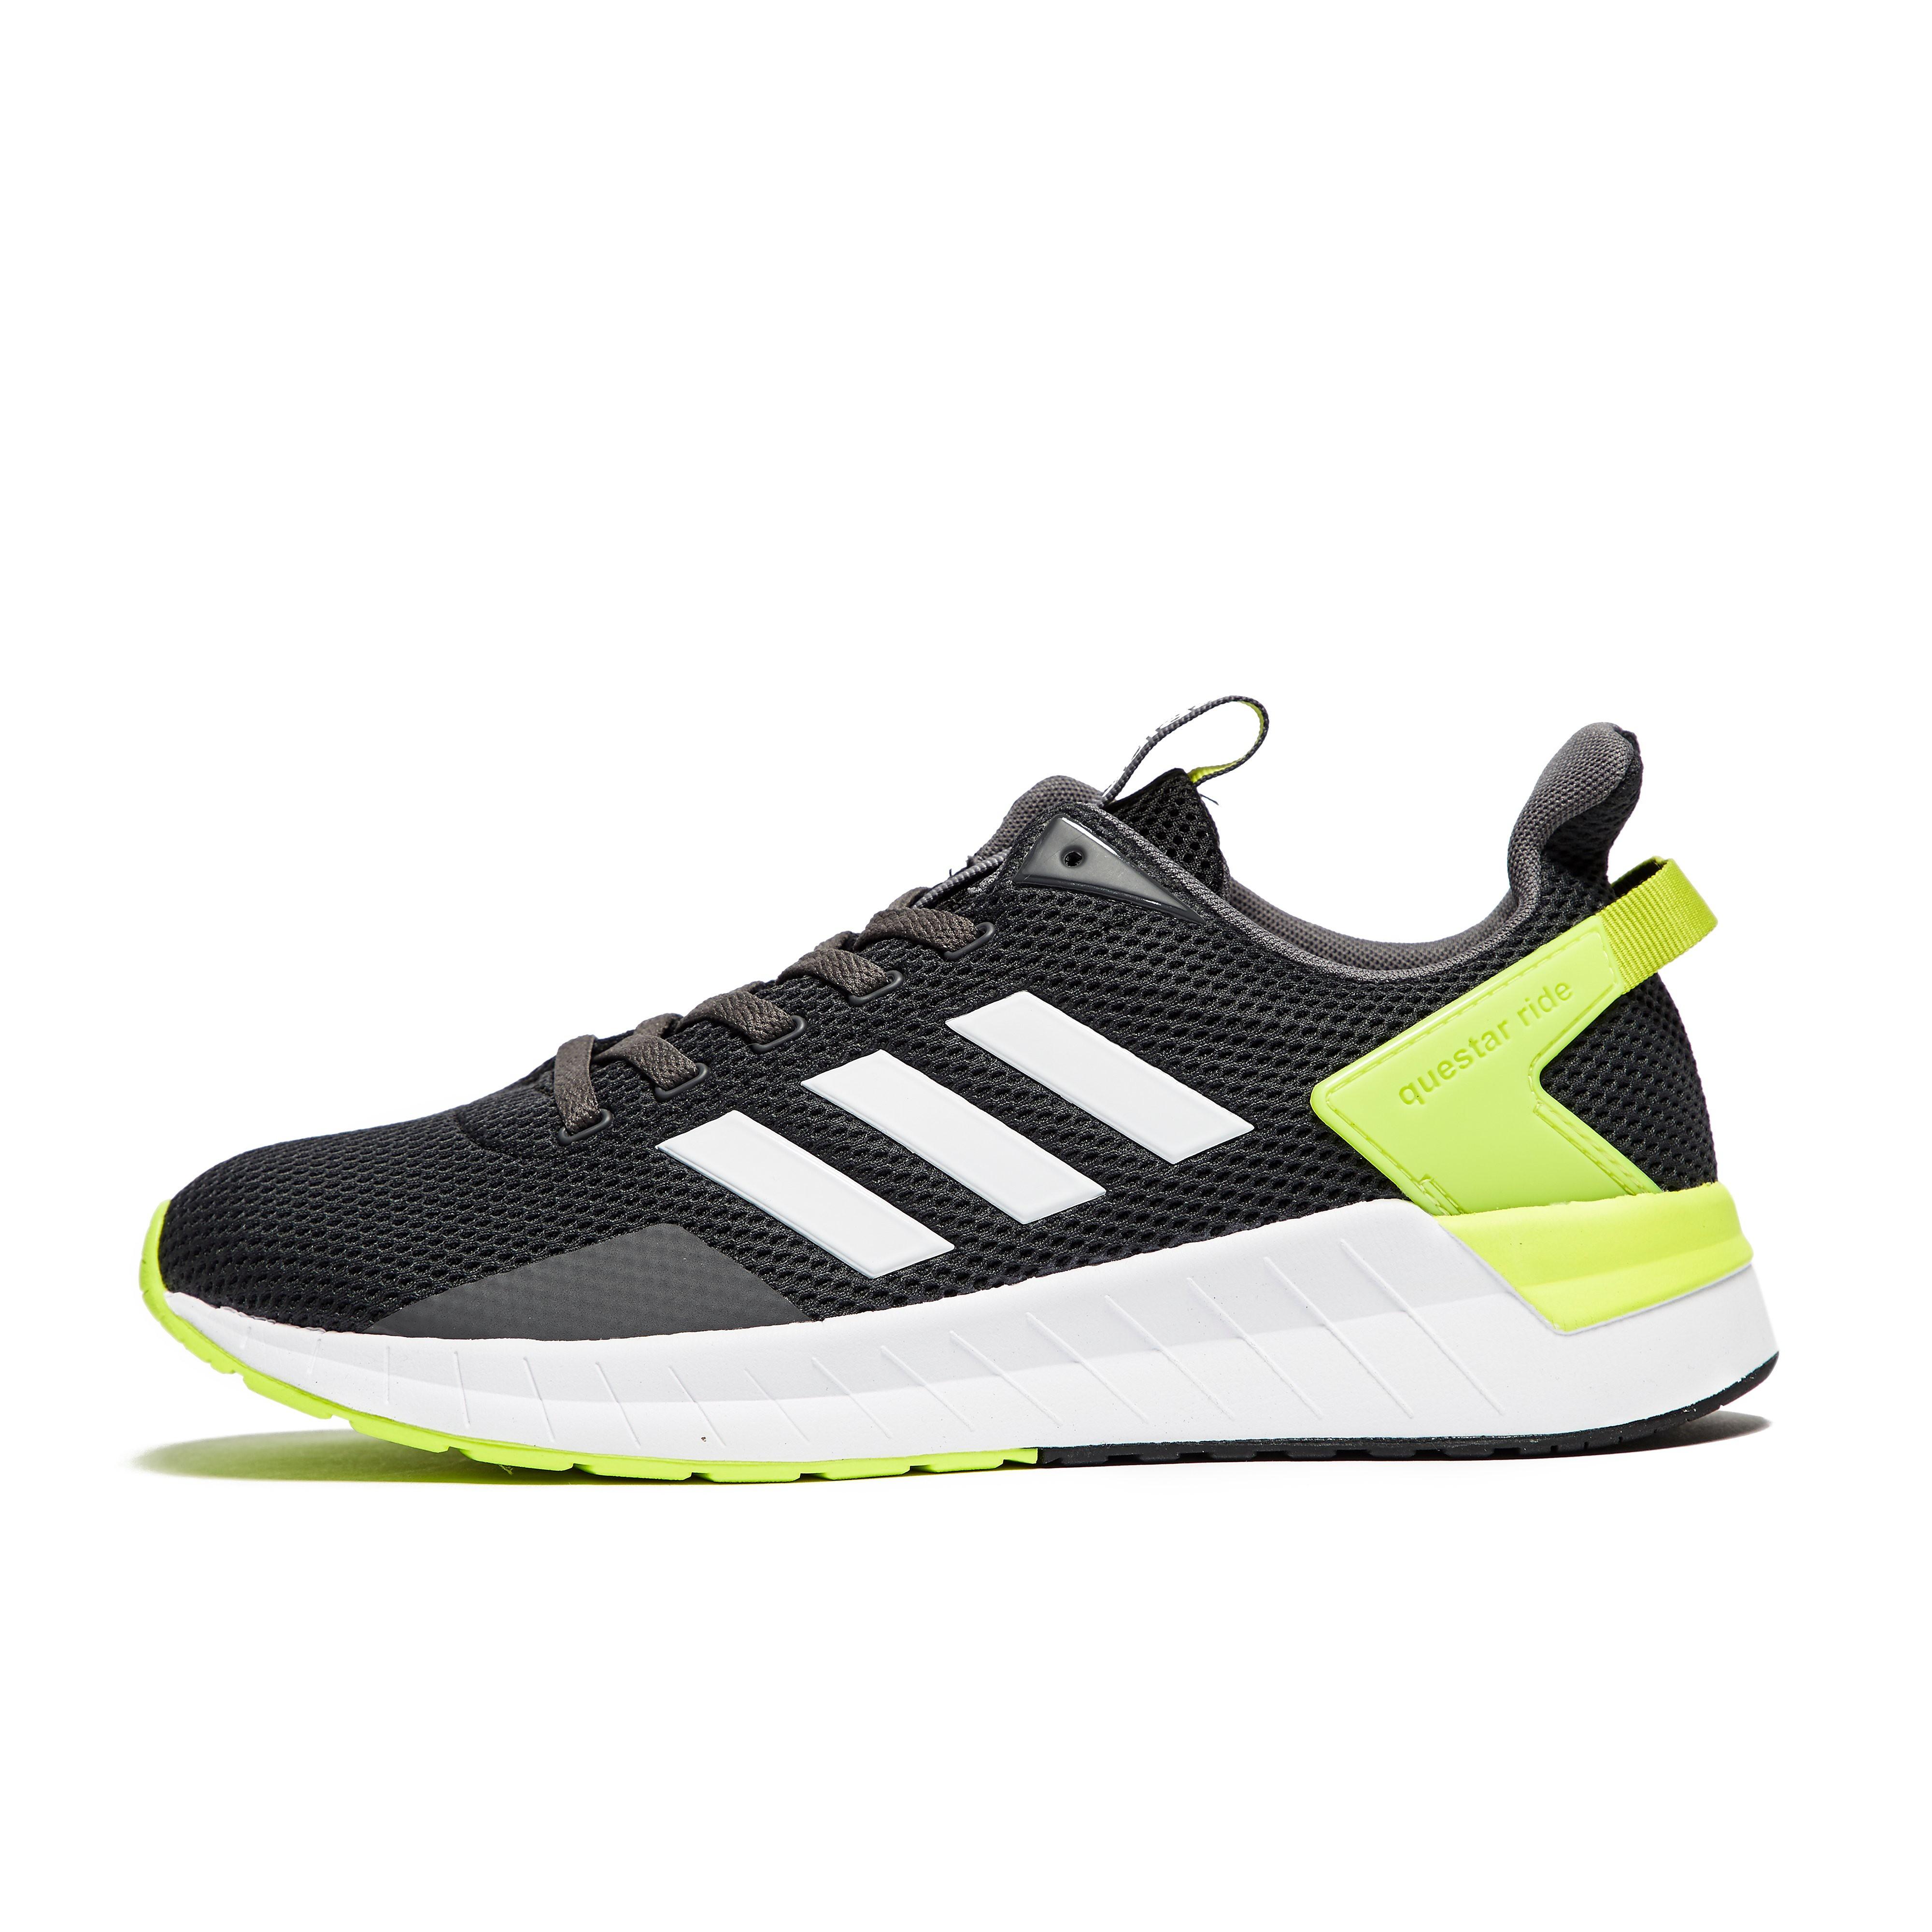 adidas Questar Drive Men's Running Shoes